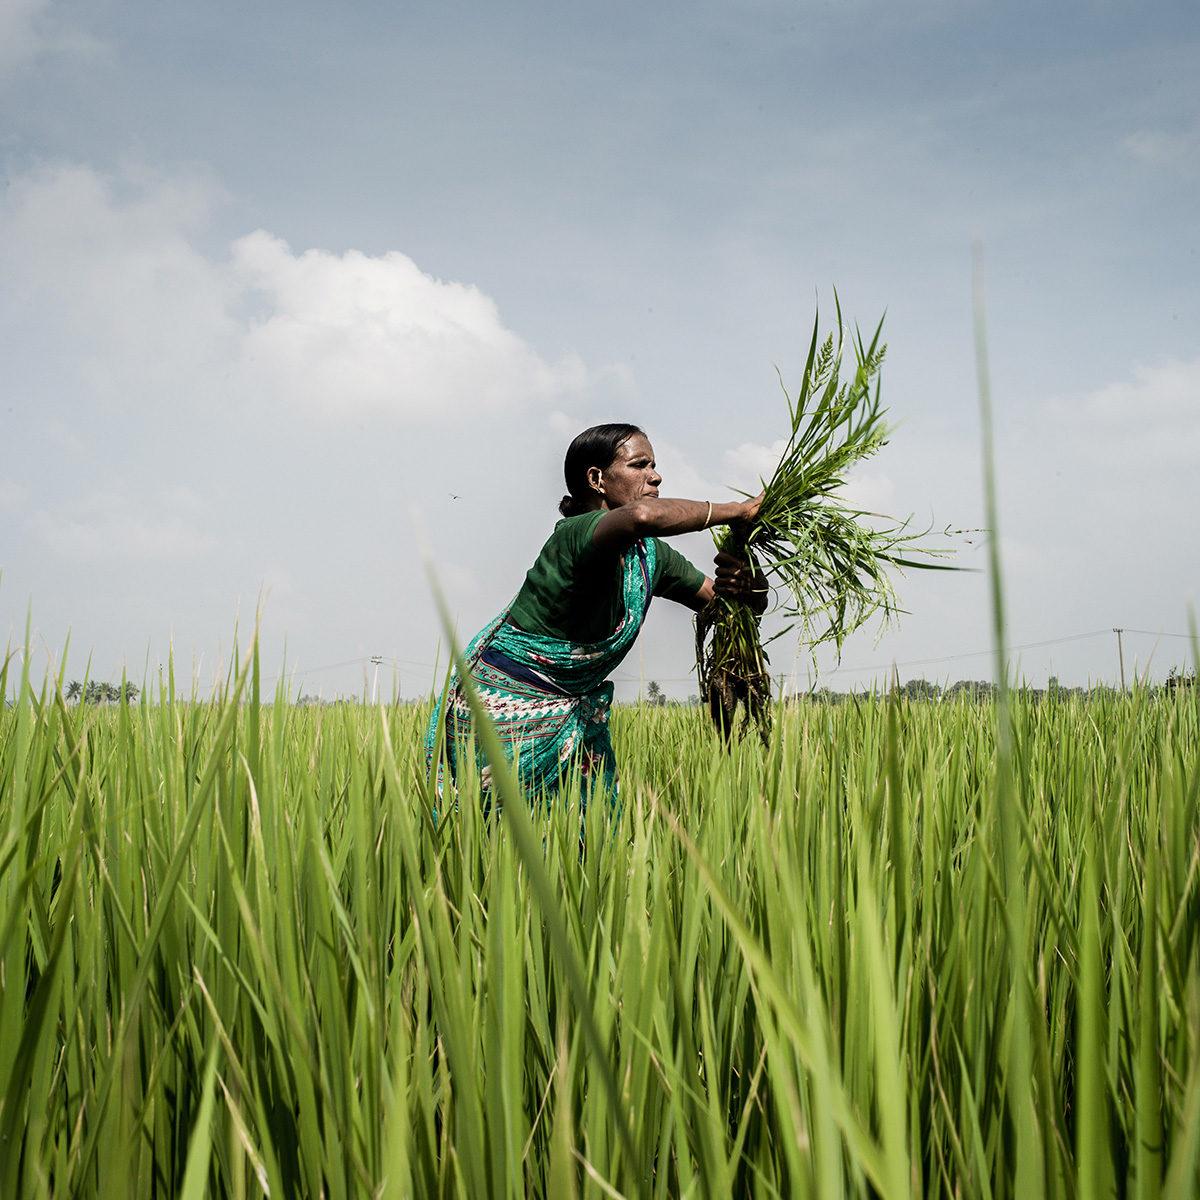 Female farmer in a rice paddy in India